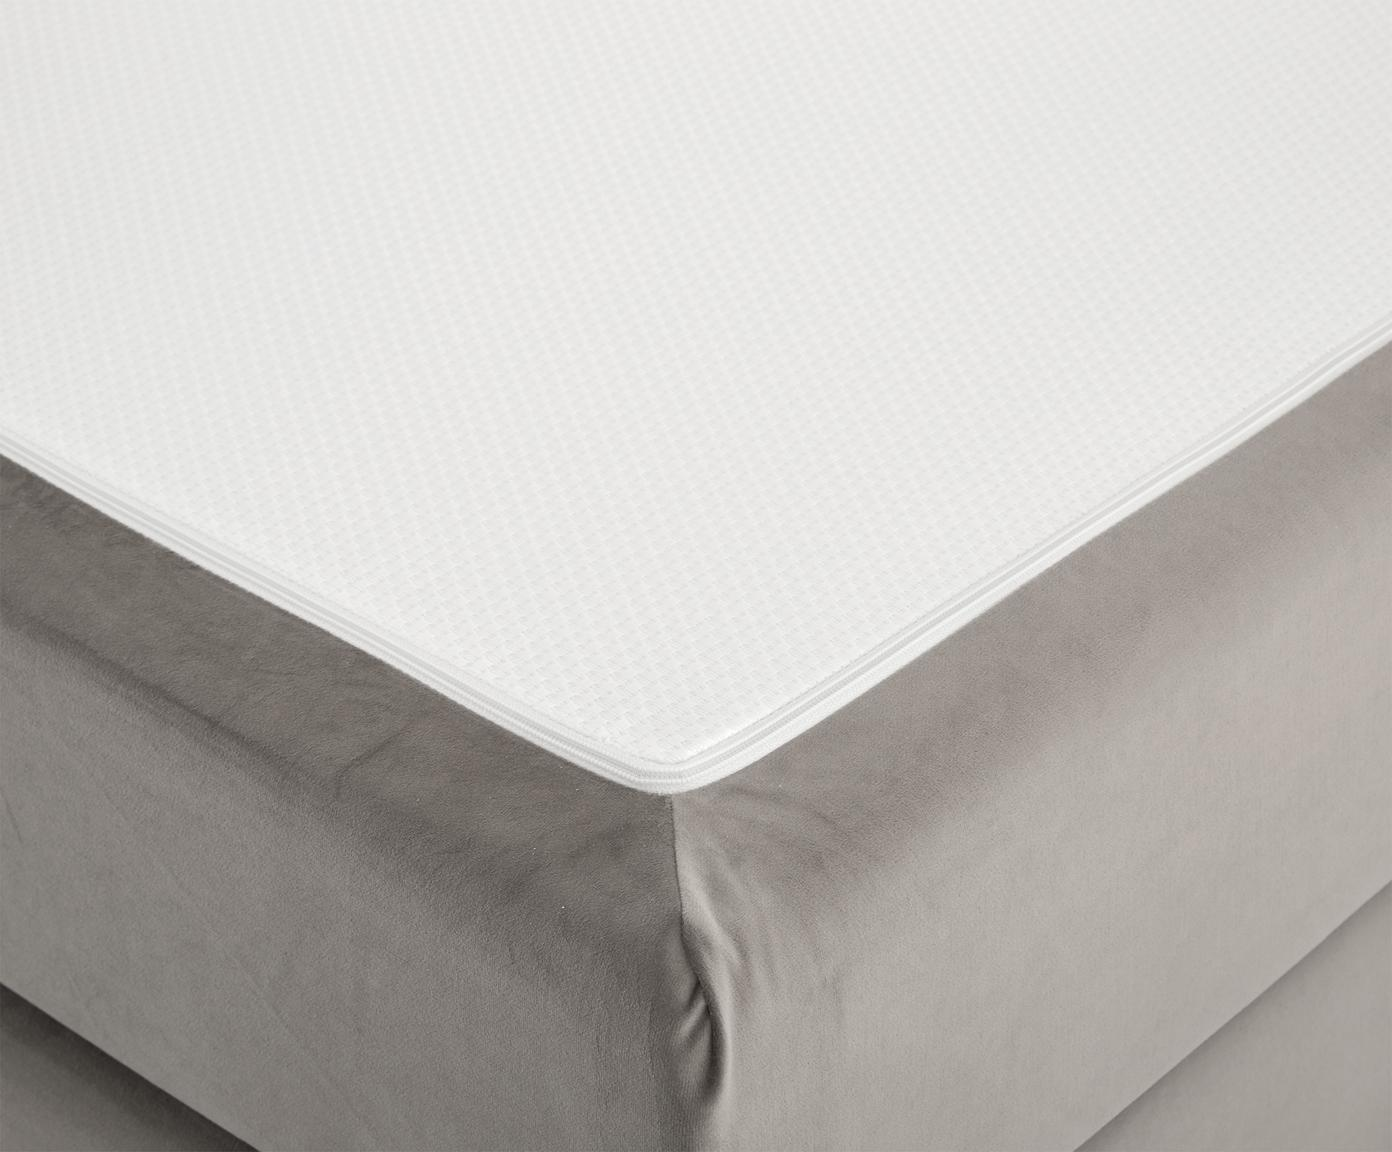 Premium fluwelen boxspring bed Phoebe, Matras: 7-zones-pocketveringkern , Poten: massief gelakt beukenhout, Taupe, 180 x 200 cm